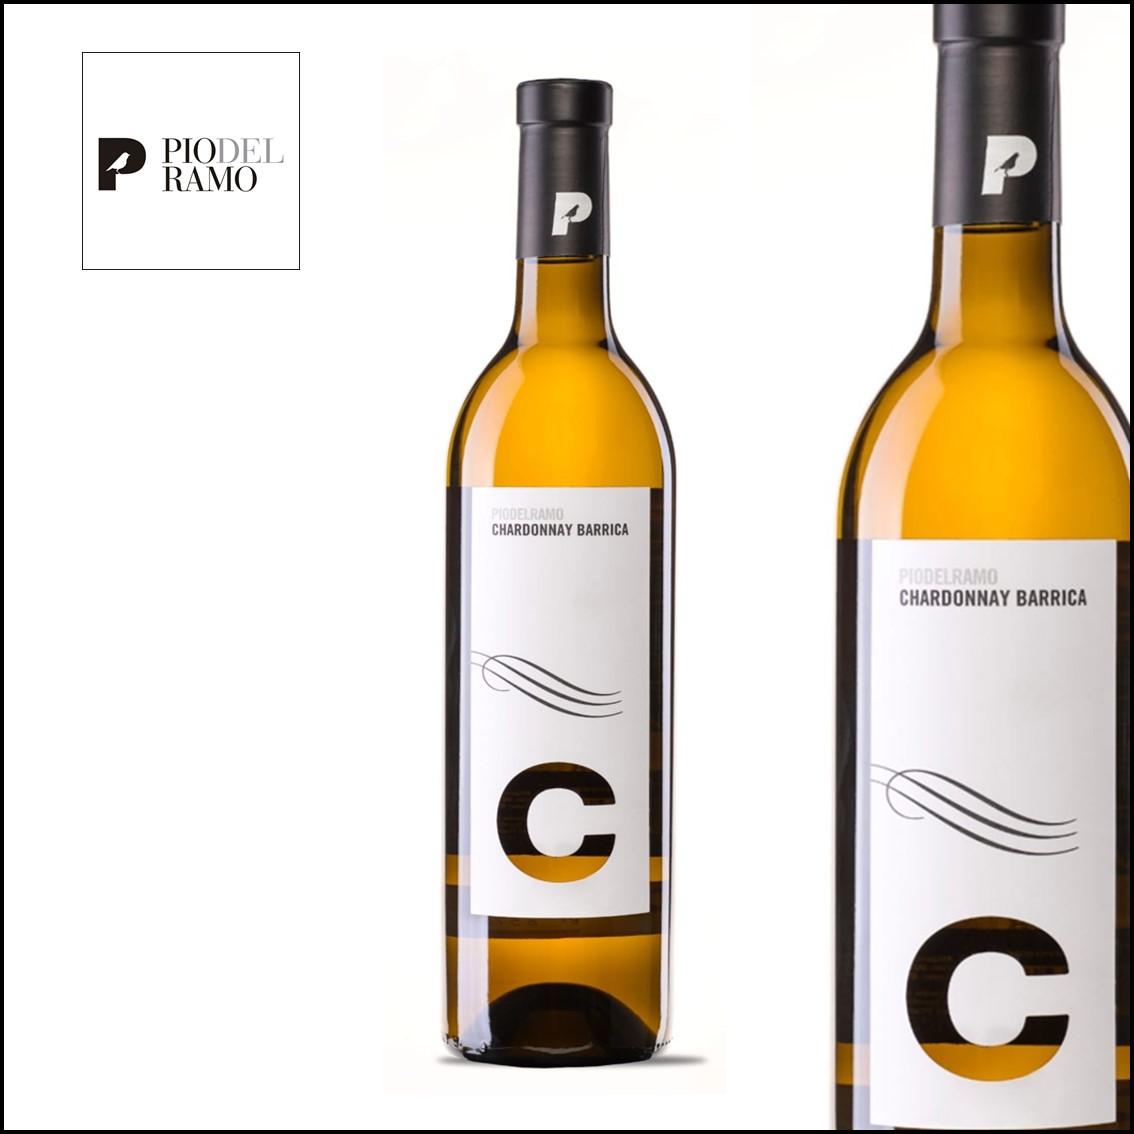 Pío del Ramo Chardonnay Barrica